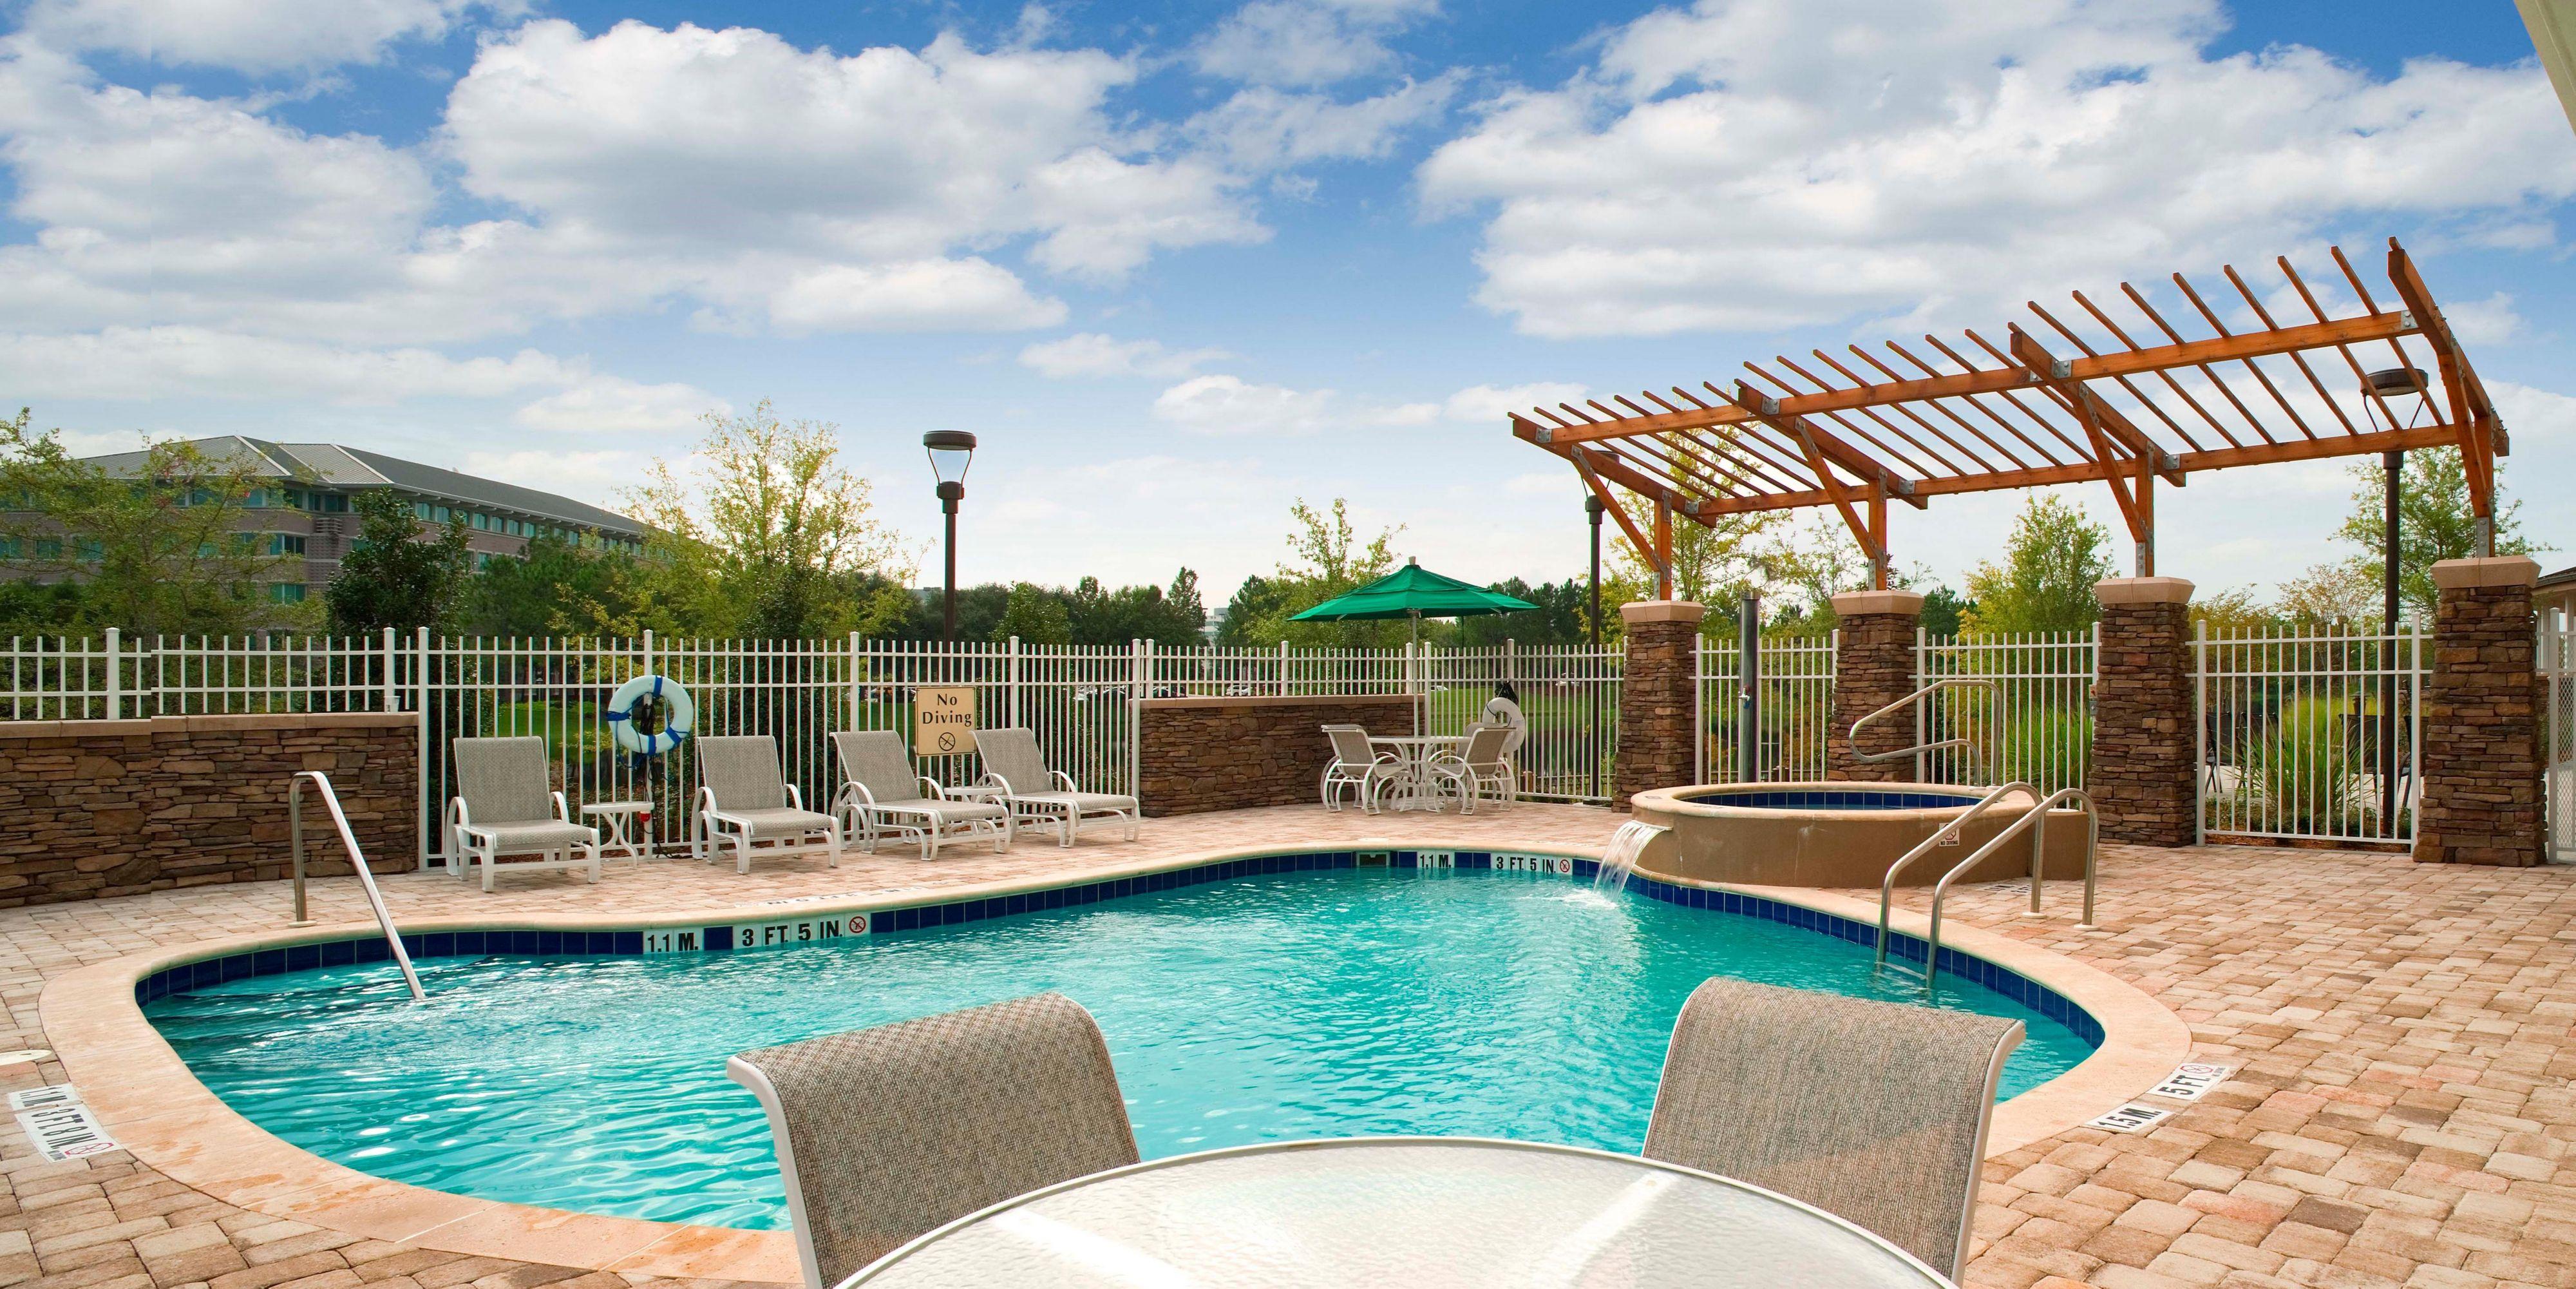 Hotel Indigo Jacksonville-Deerwood Park image 2